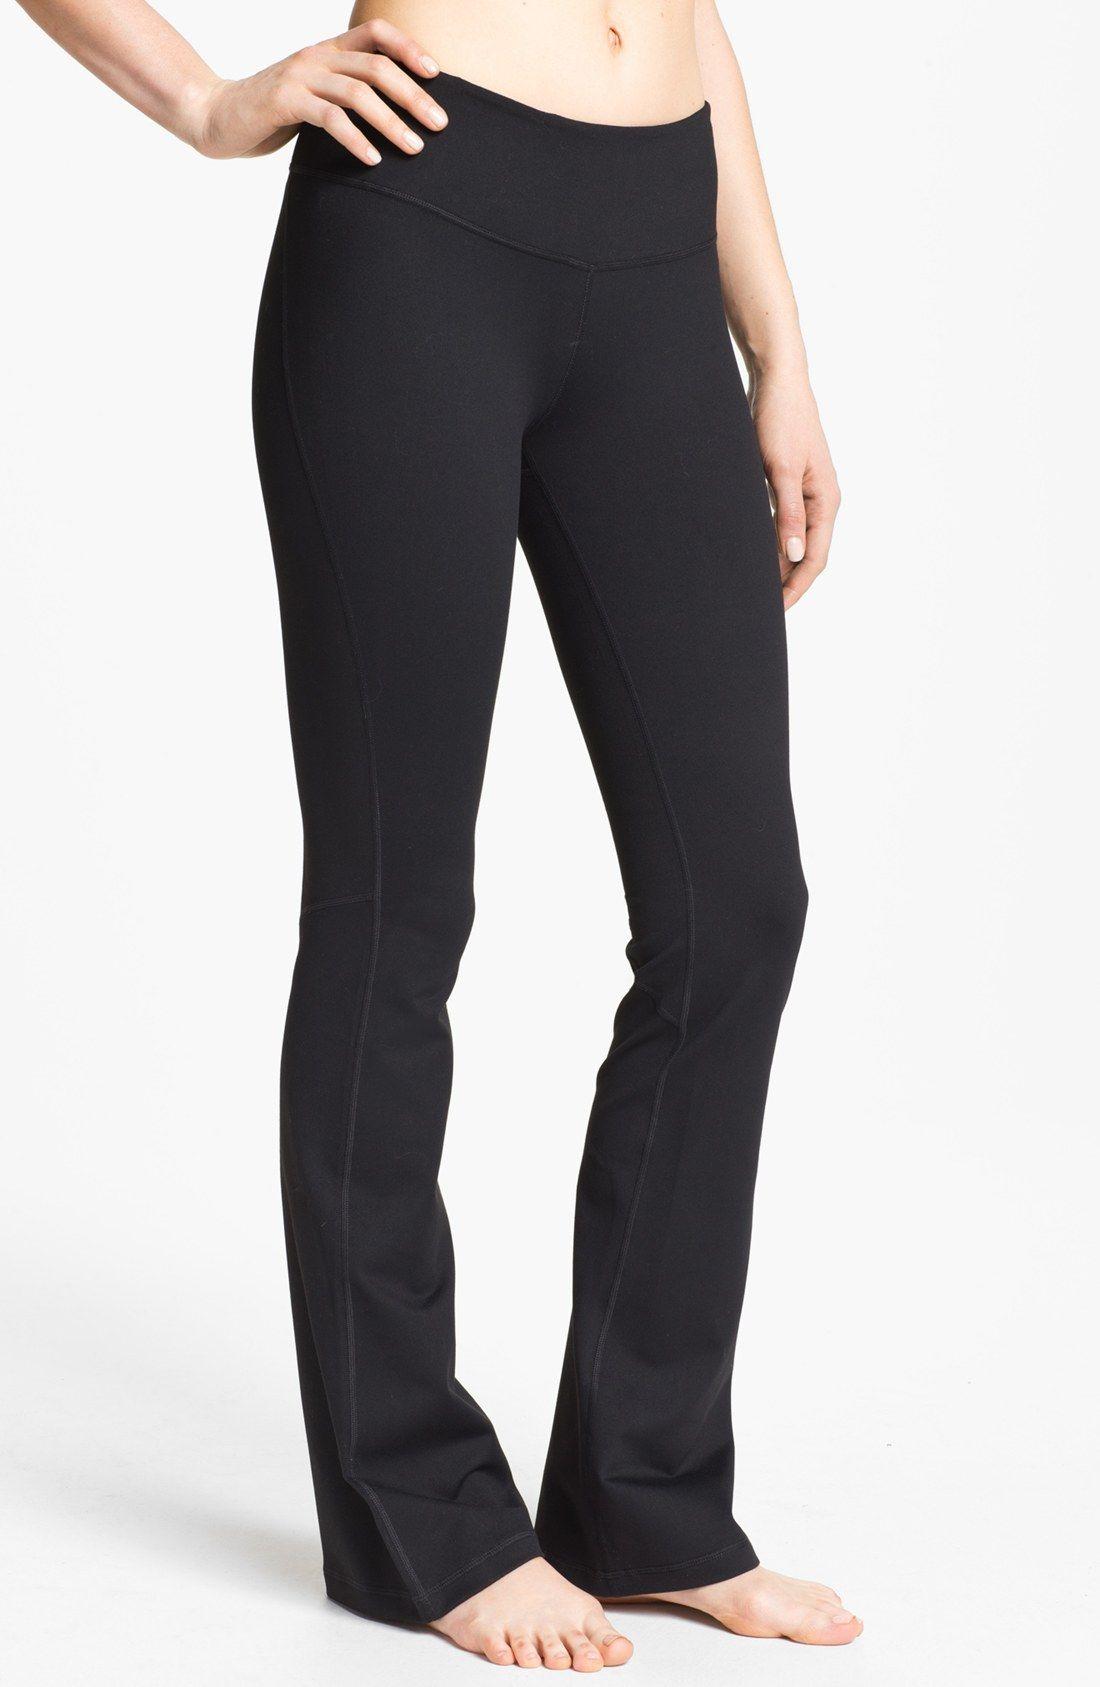 Zella 'Barely Flare Booty' Pants